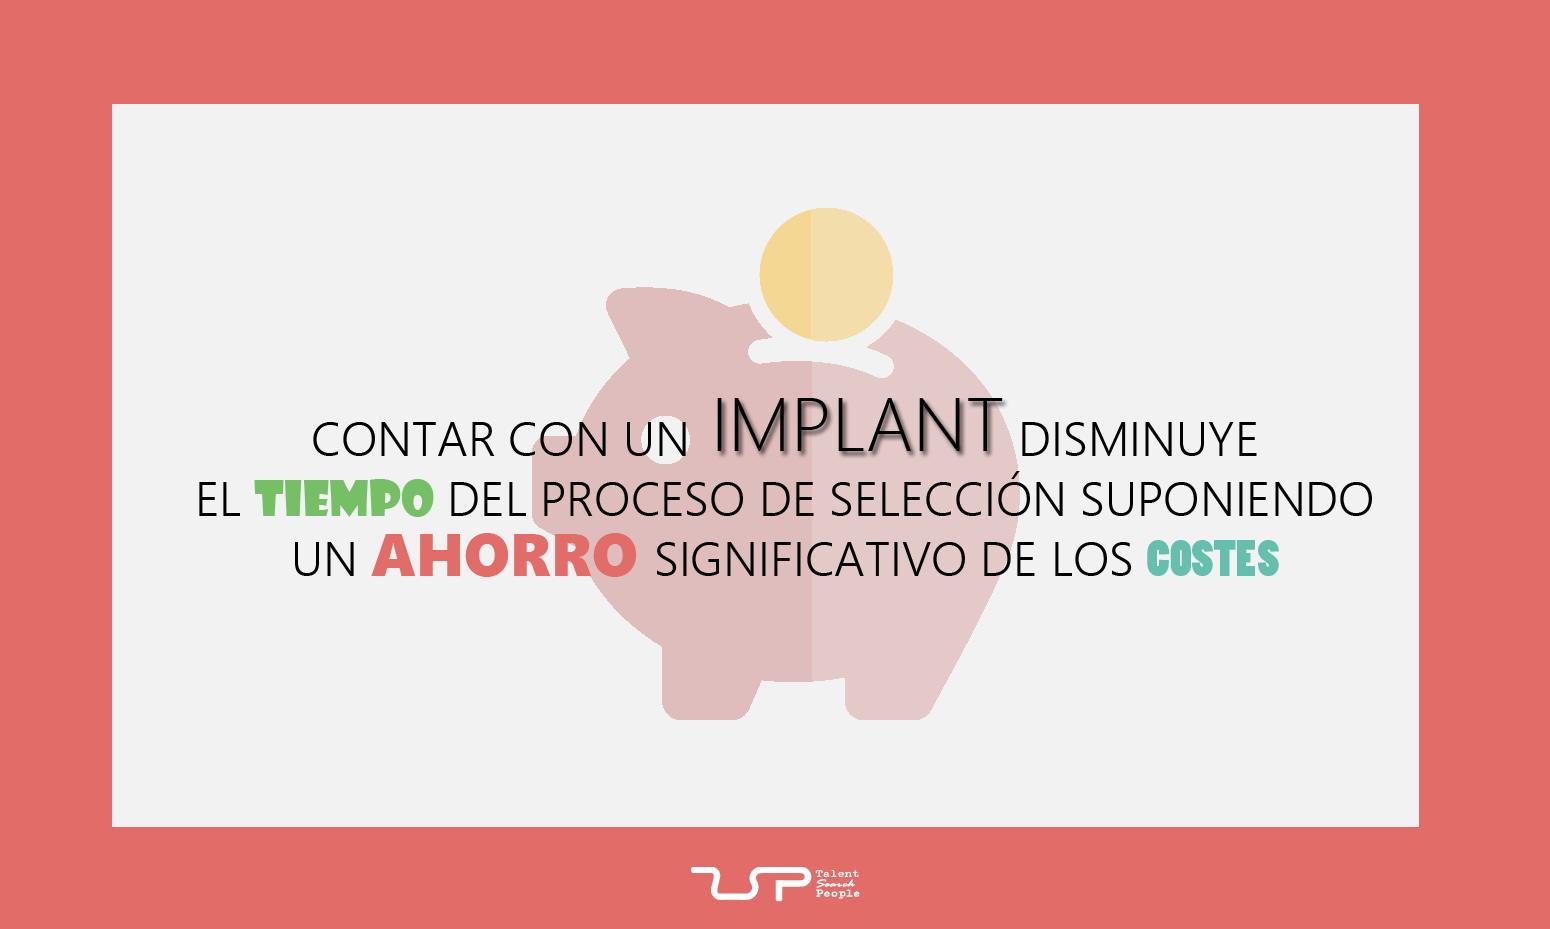 Servicio Implant_Talent Search People